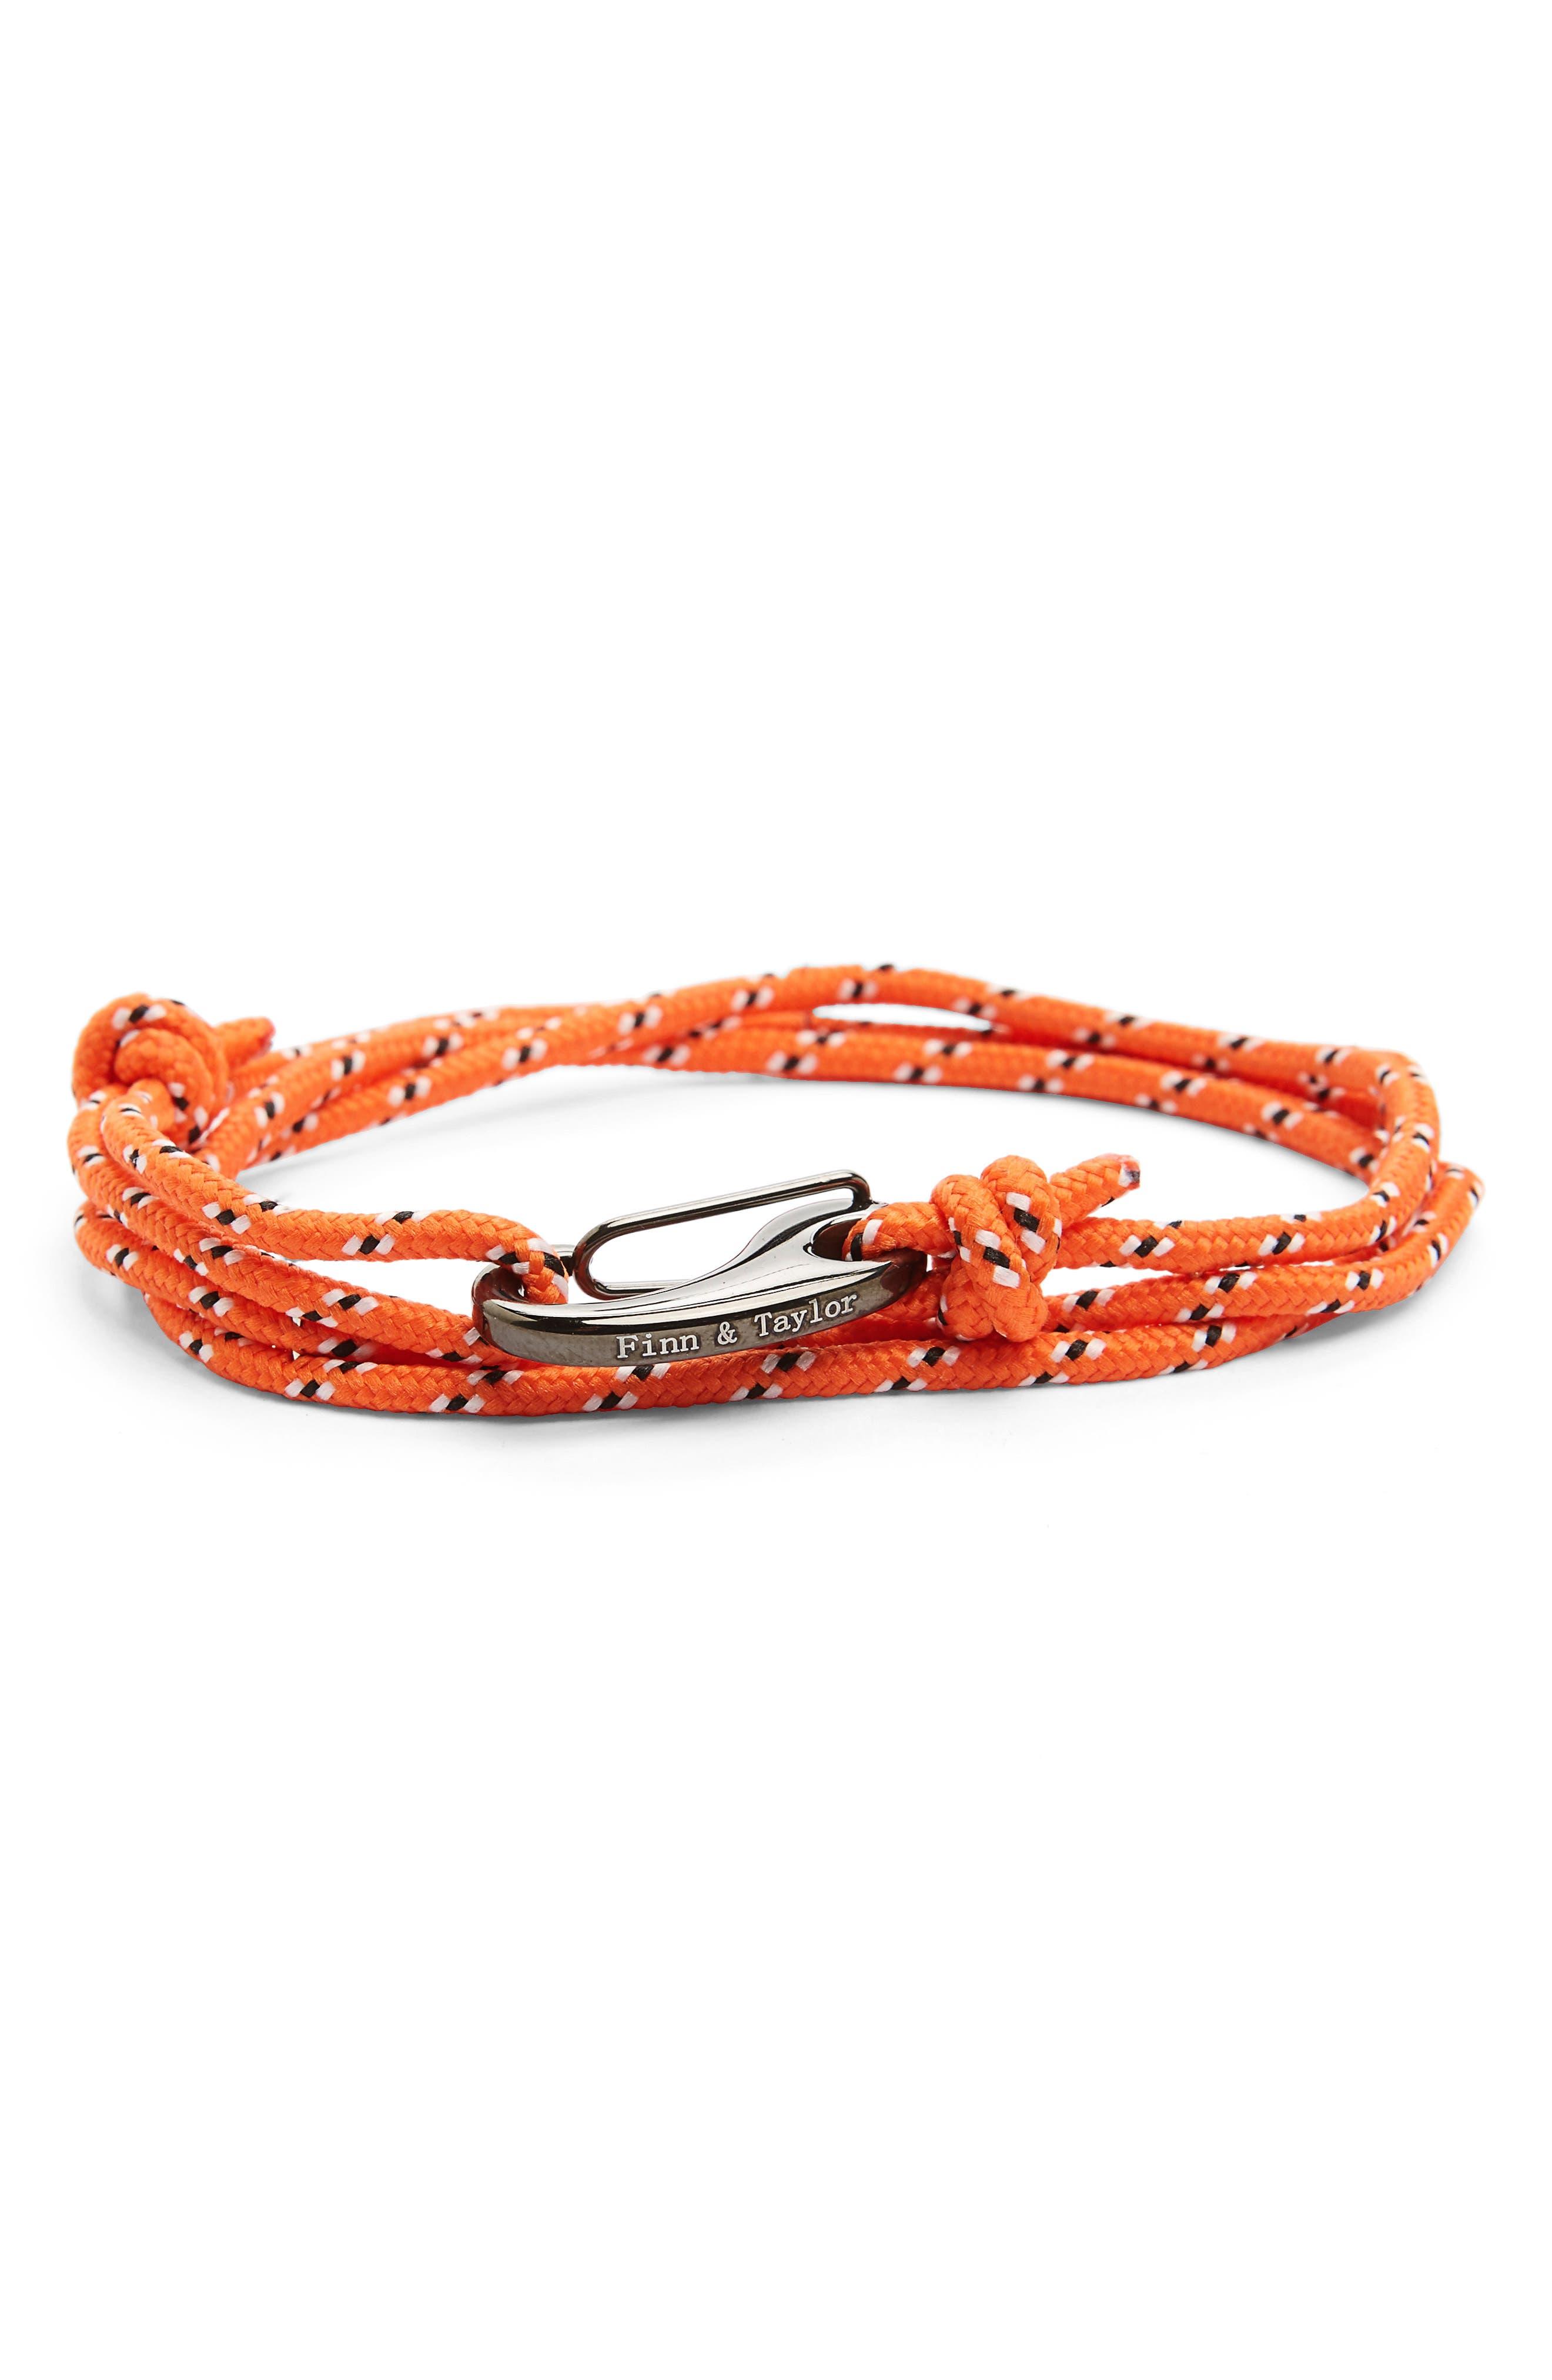 Finn & Taylor Wrap Bracelet,                             Main thumbnail 1, color,                             Orange